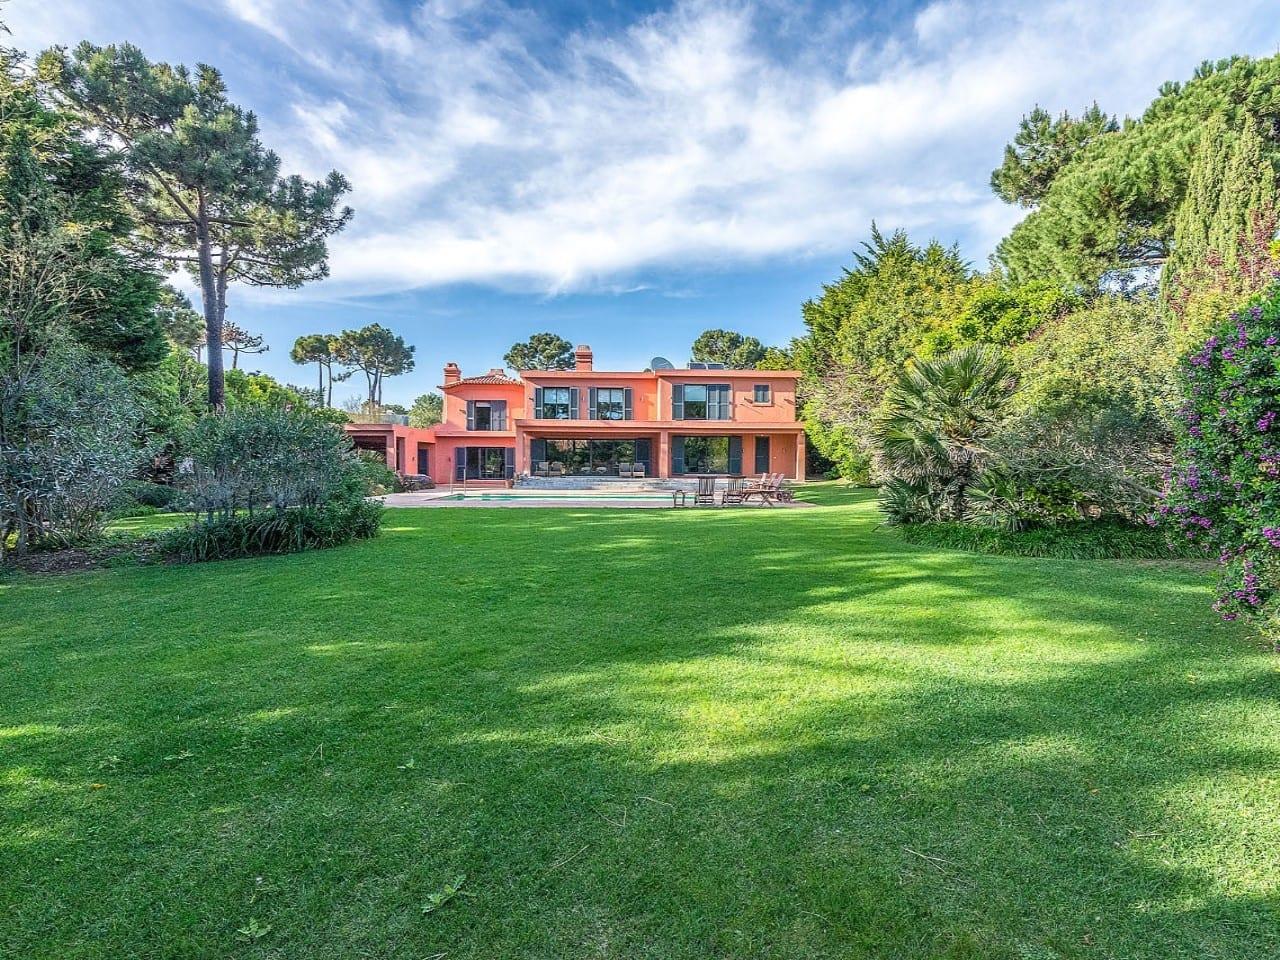 Quinta da Marinha Cascais hus till salu